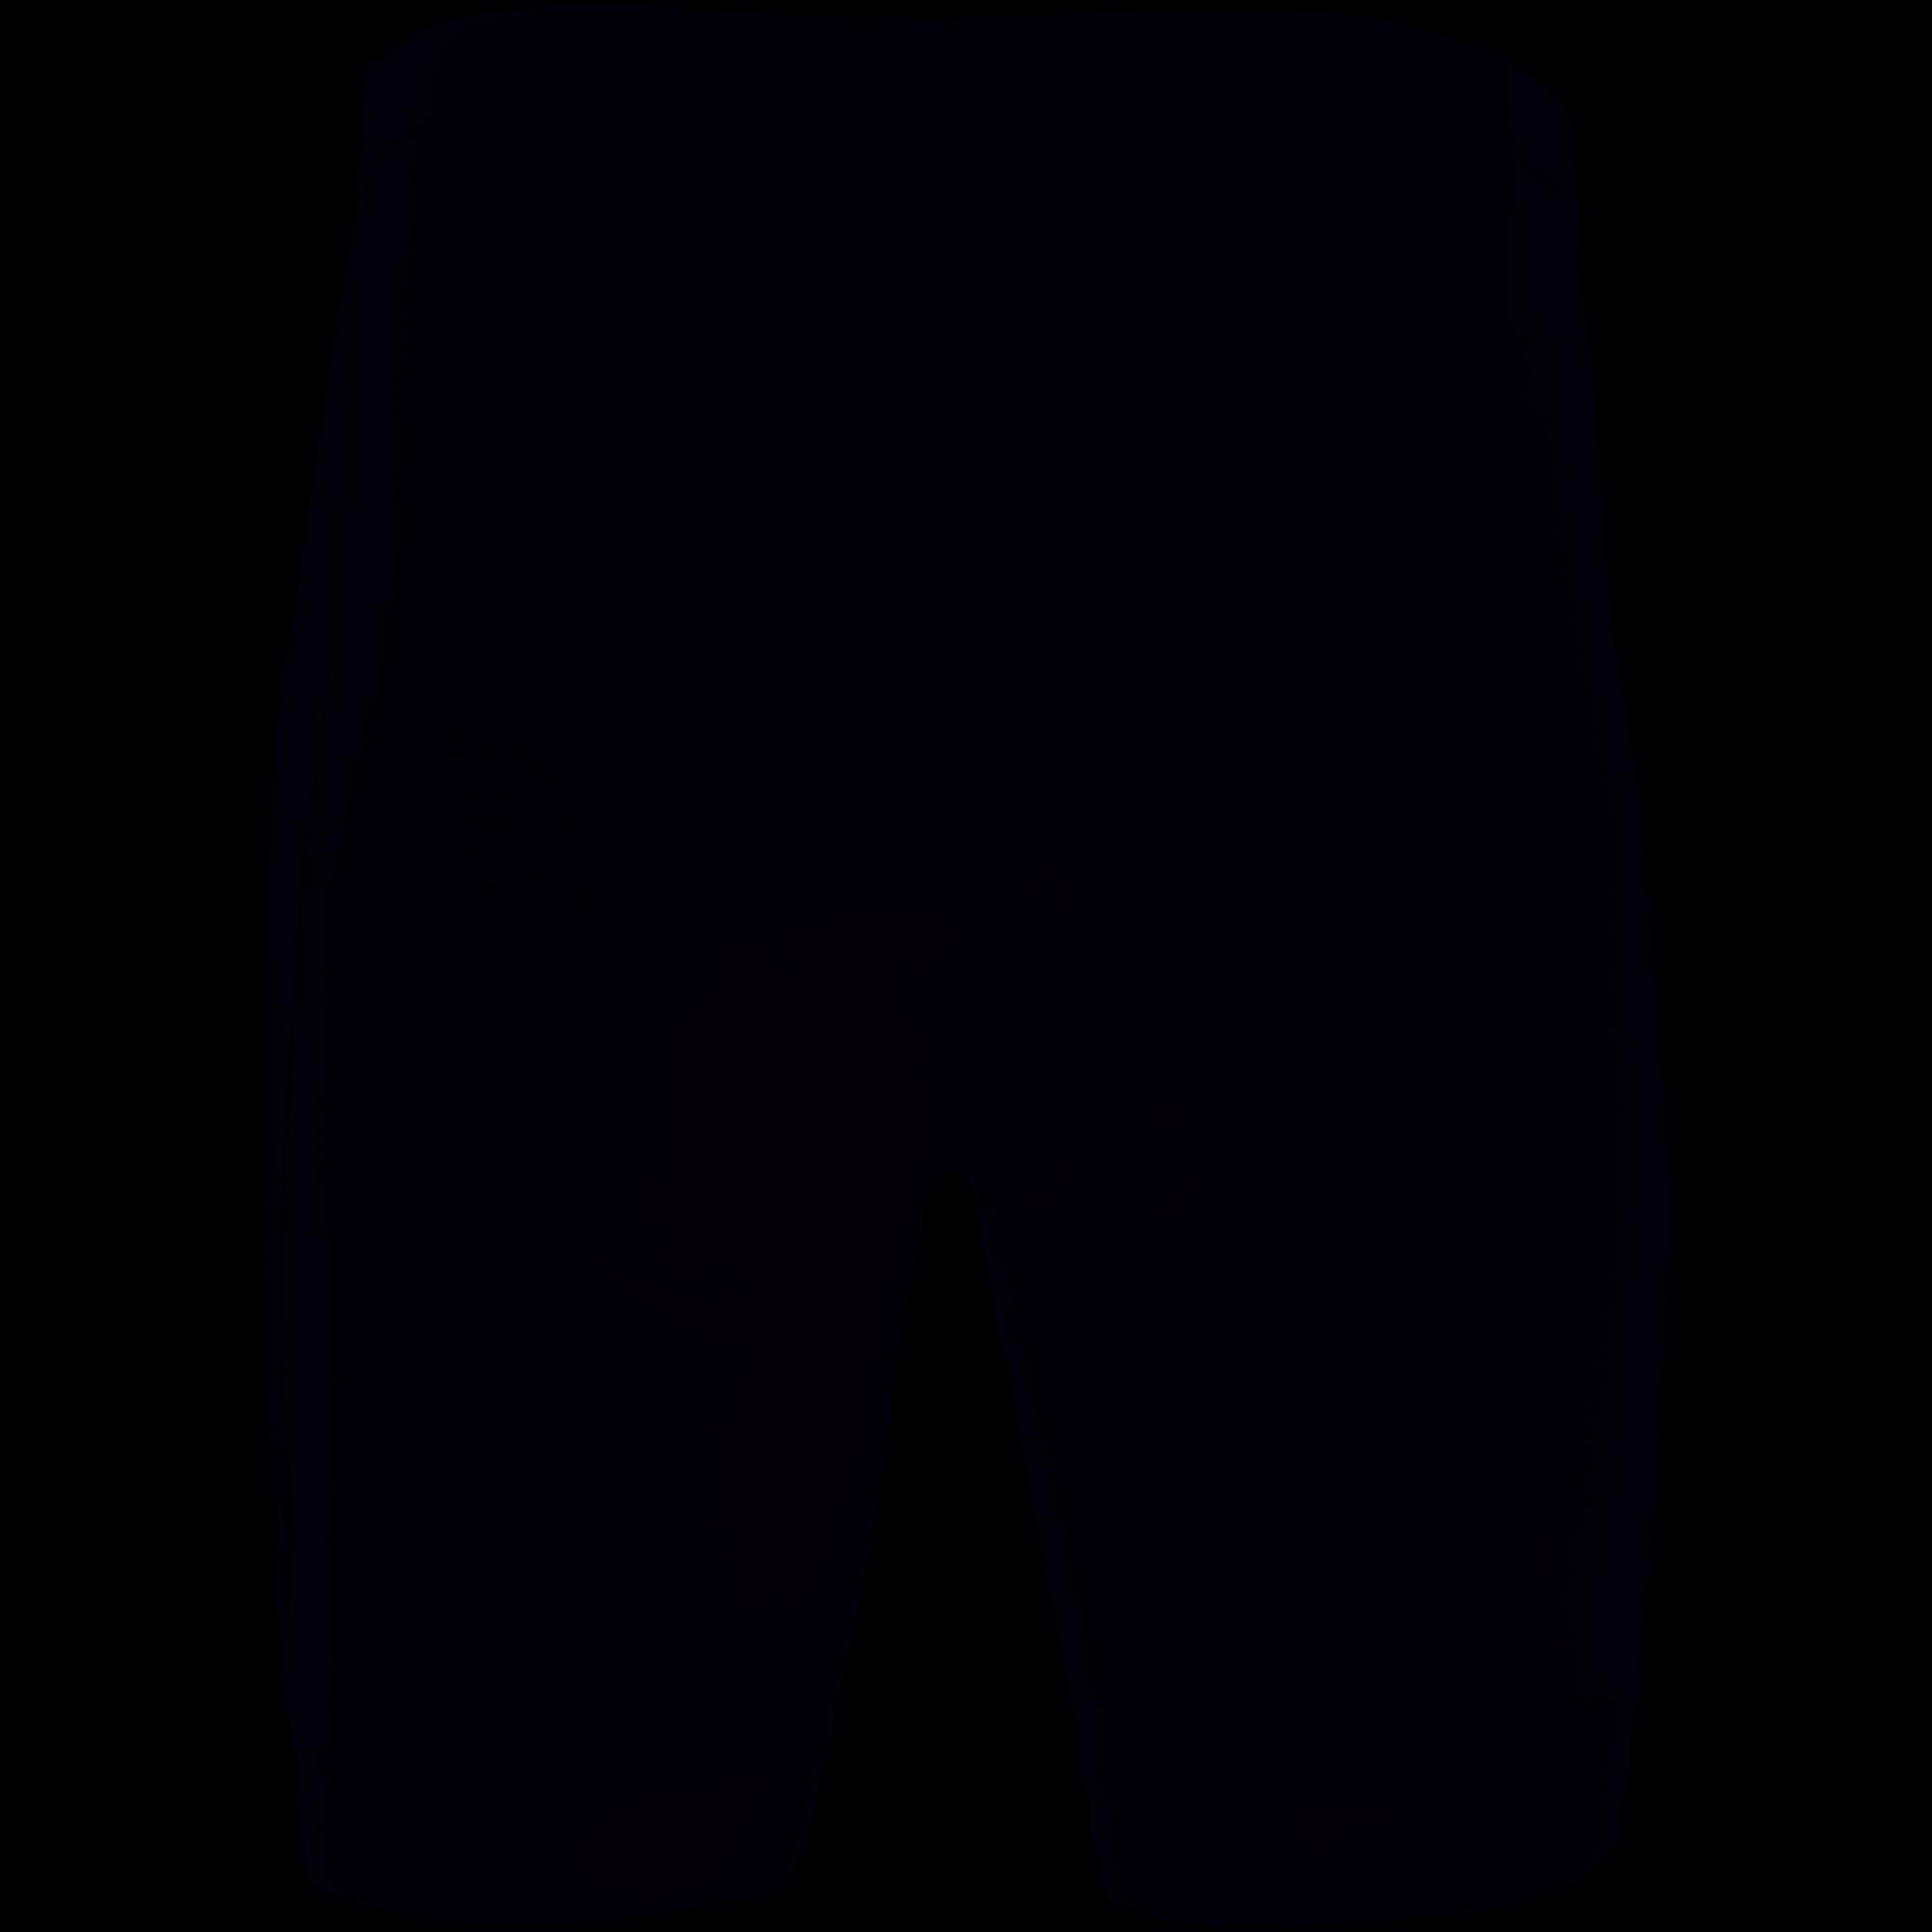 Gonso Hr. Radhose Cancun 16111 schwarz